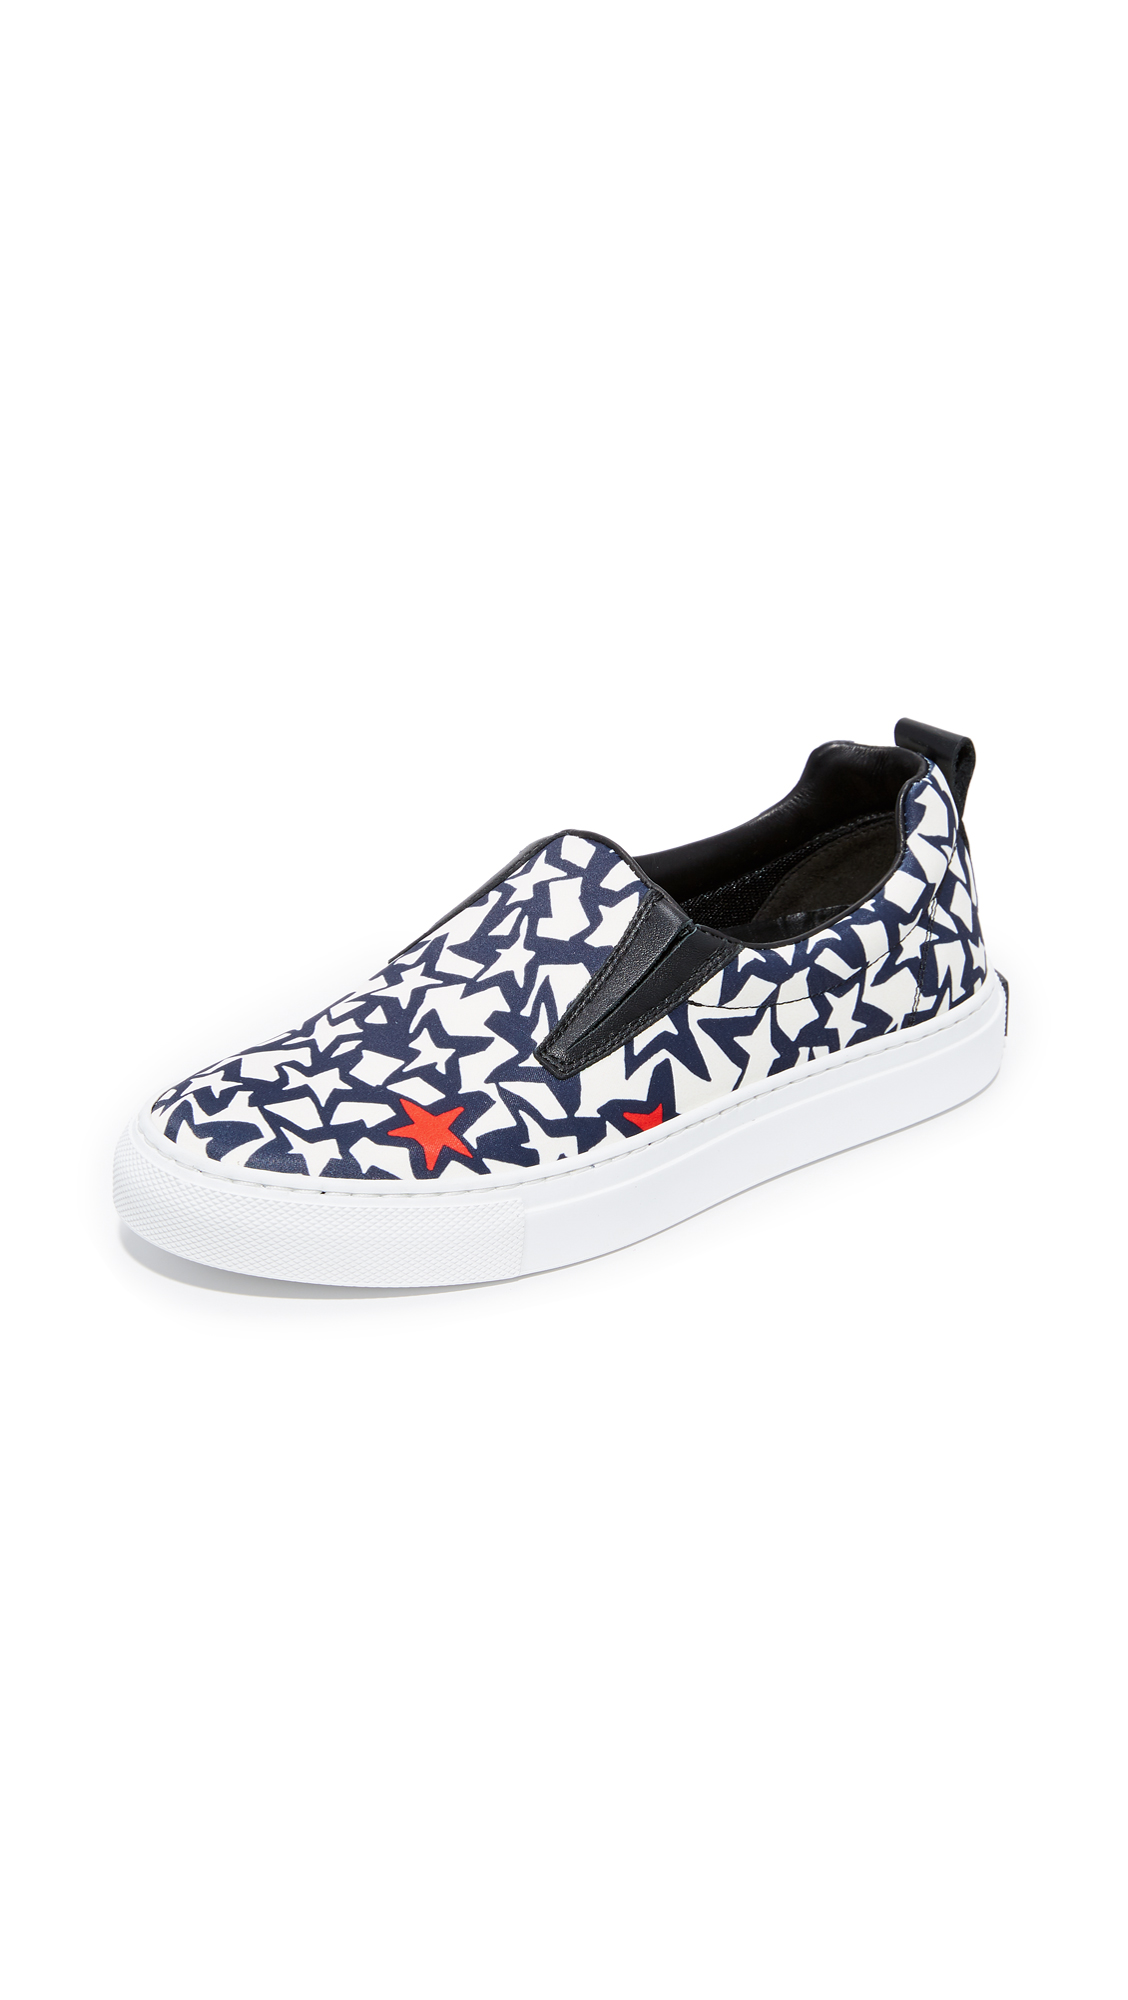 MSGM Slip On Sneakers - Blue/White